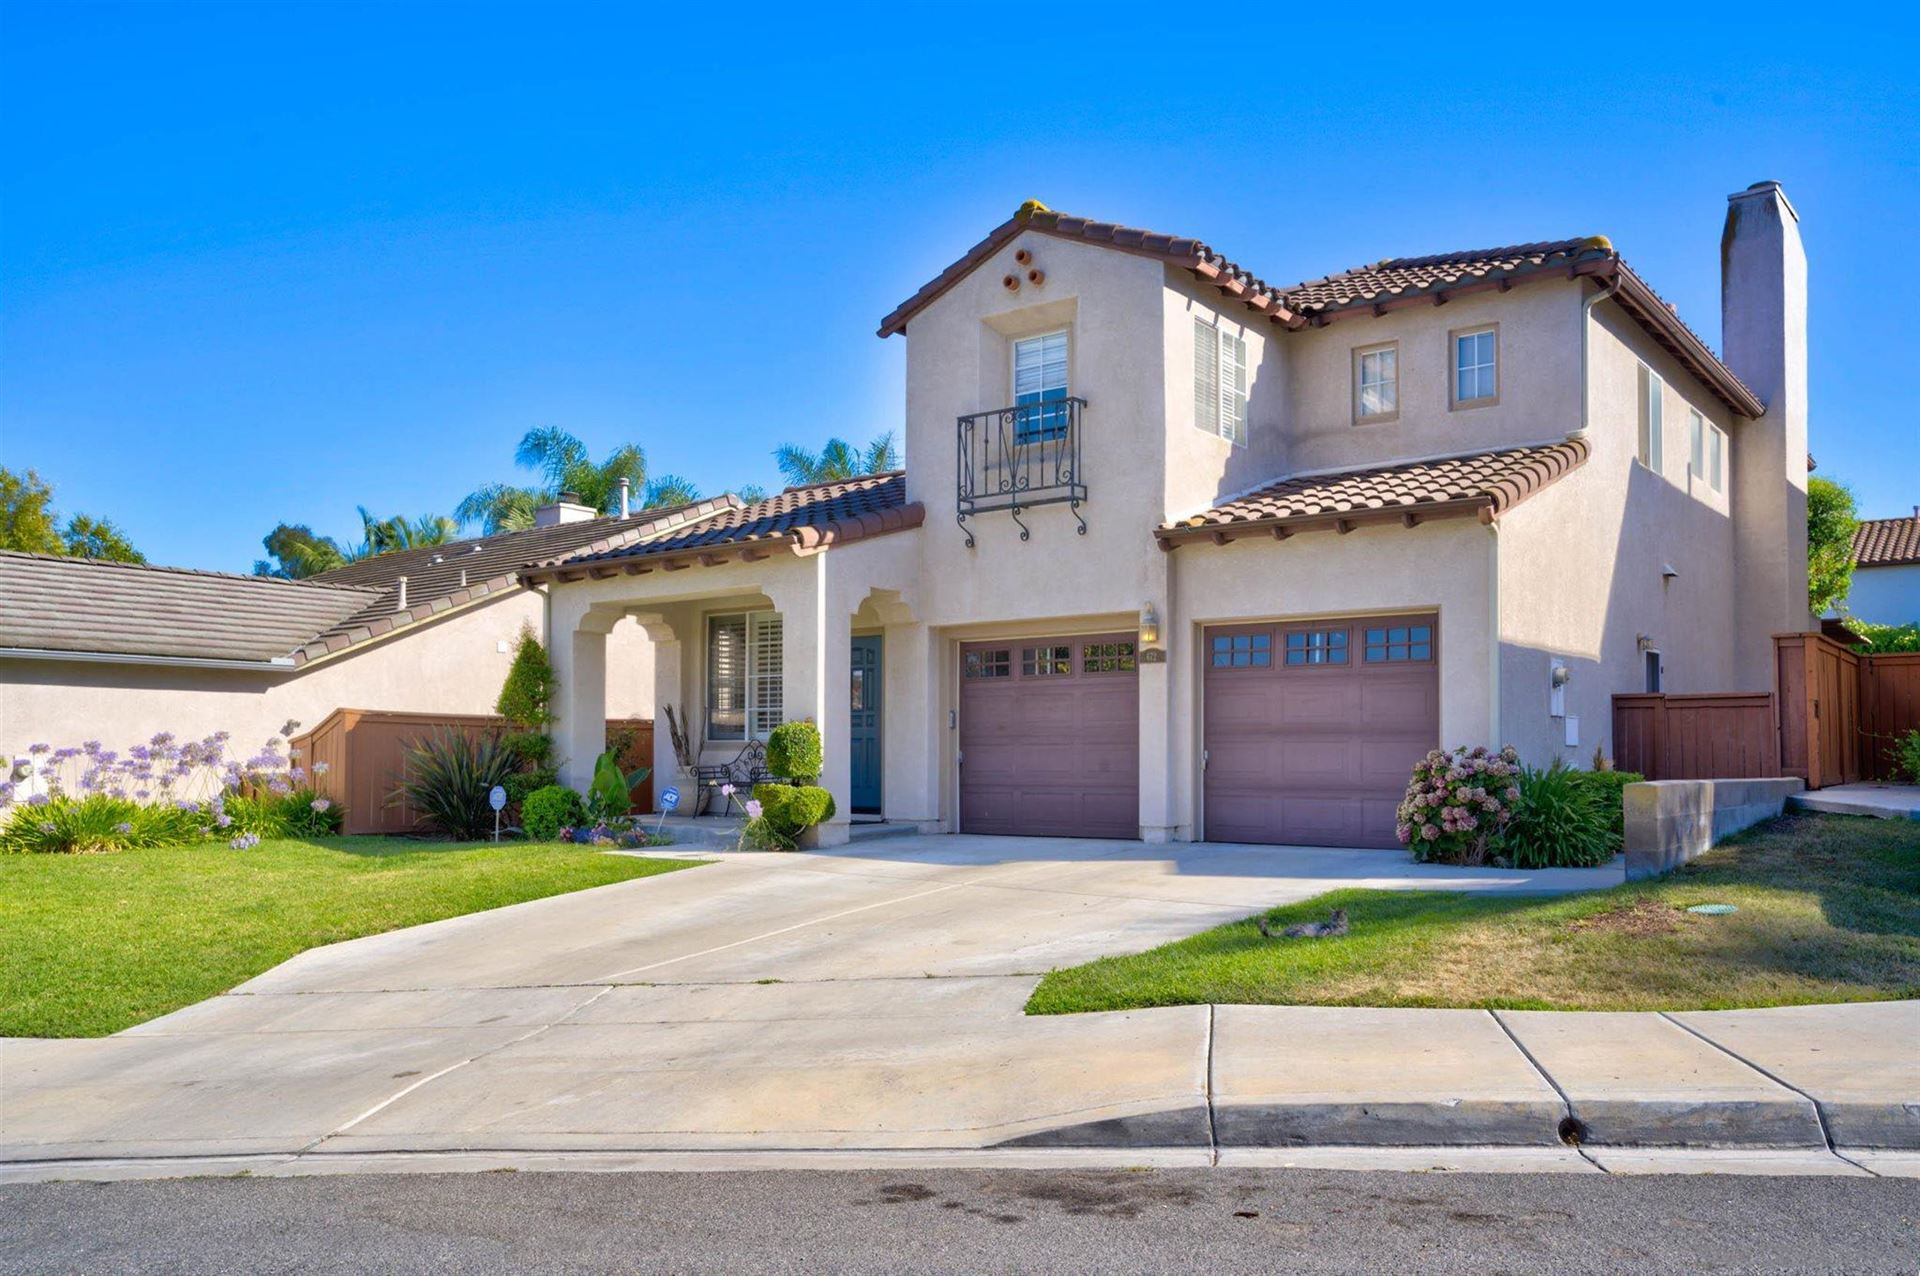 Photo of 672 San Jose Ct, Chula Vista, CA 91914 (MLS # 210021875)